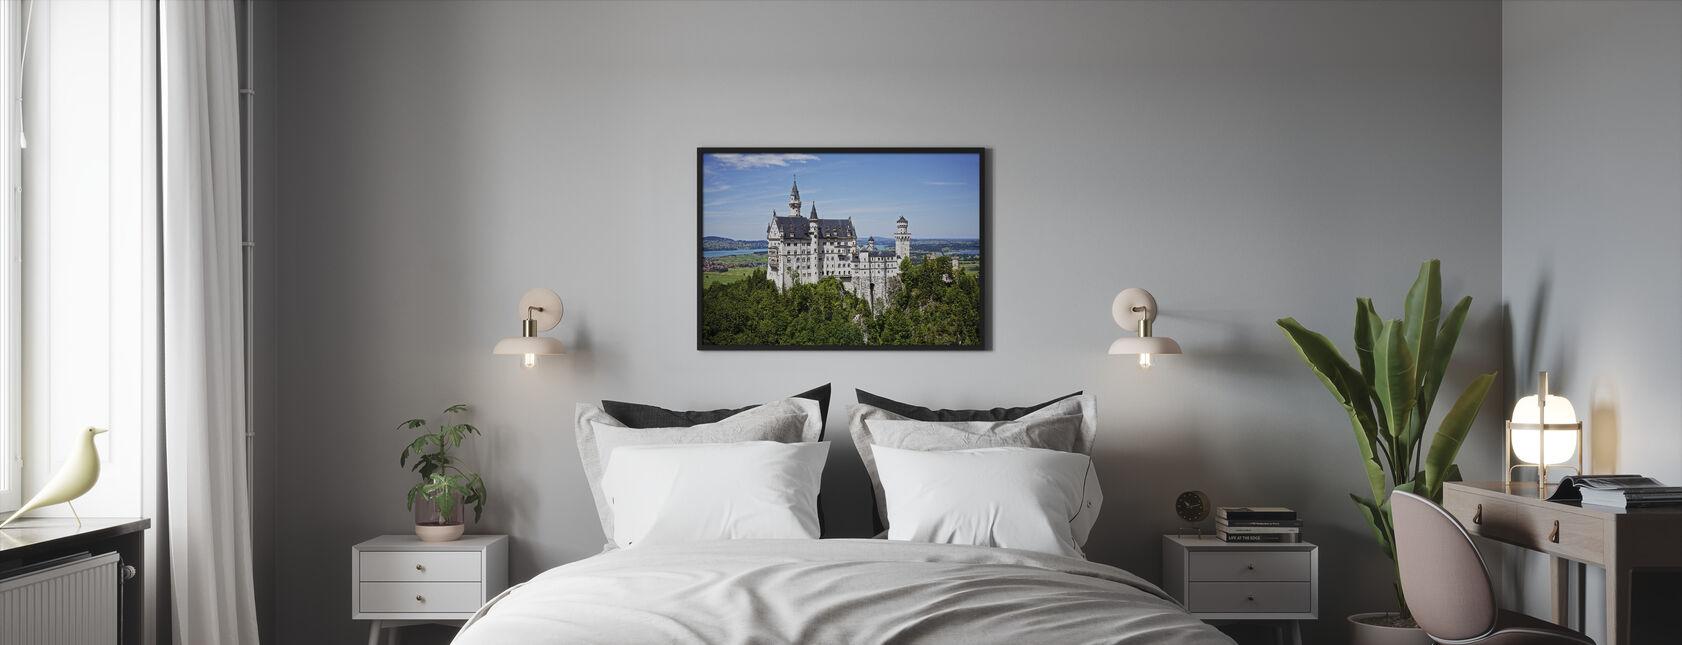 Neuschwanstein Disney Castle - Framed print - Bedroom